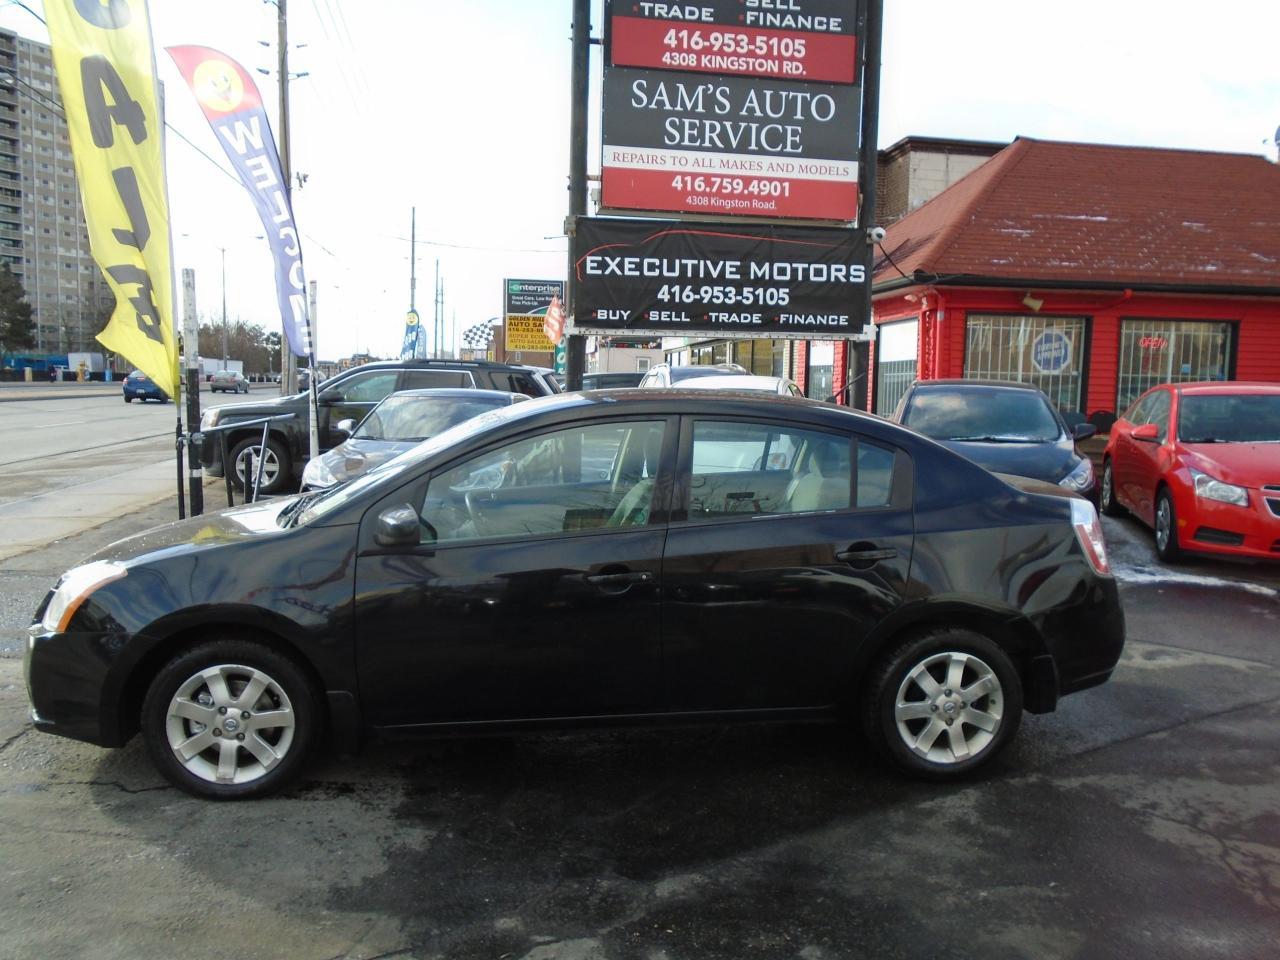 2008 Nissan Sentra 2.0 S / KEYLESS ENTRY/ ALLOYS / NEW BRAKES /LOW KM